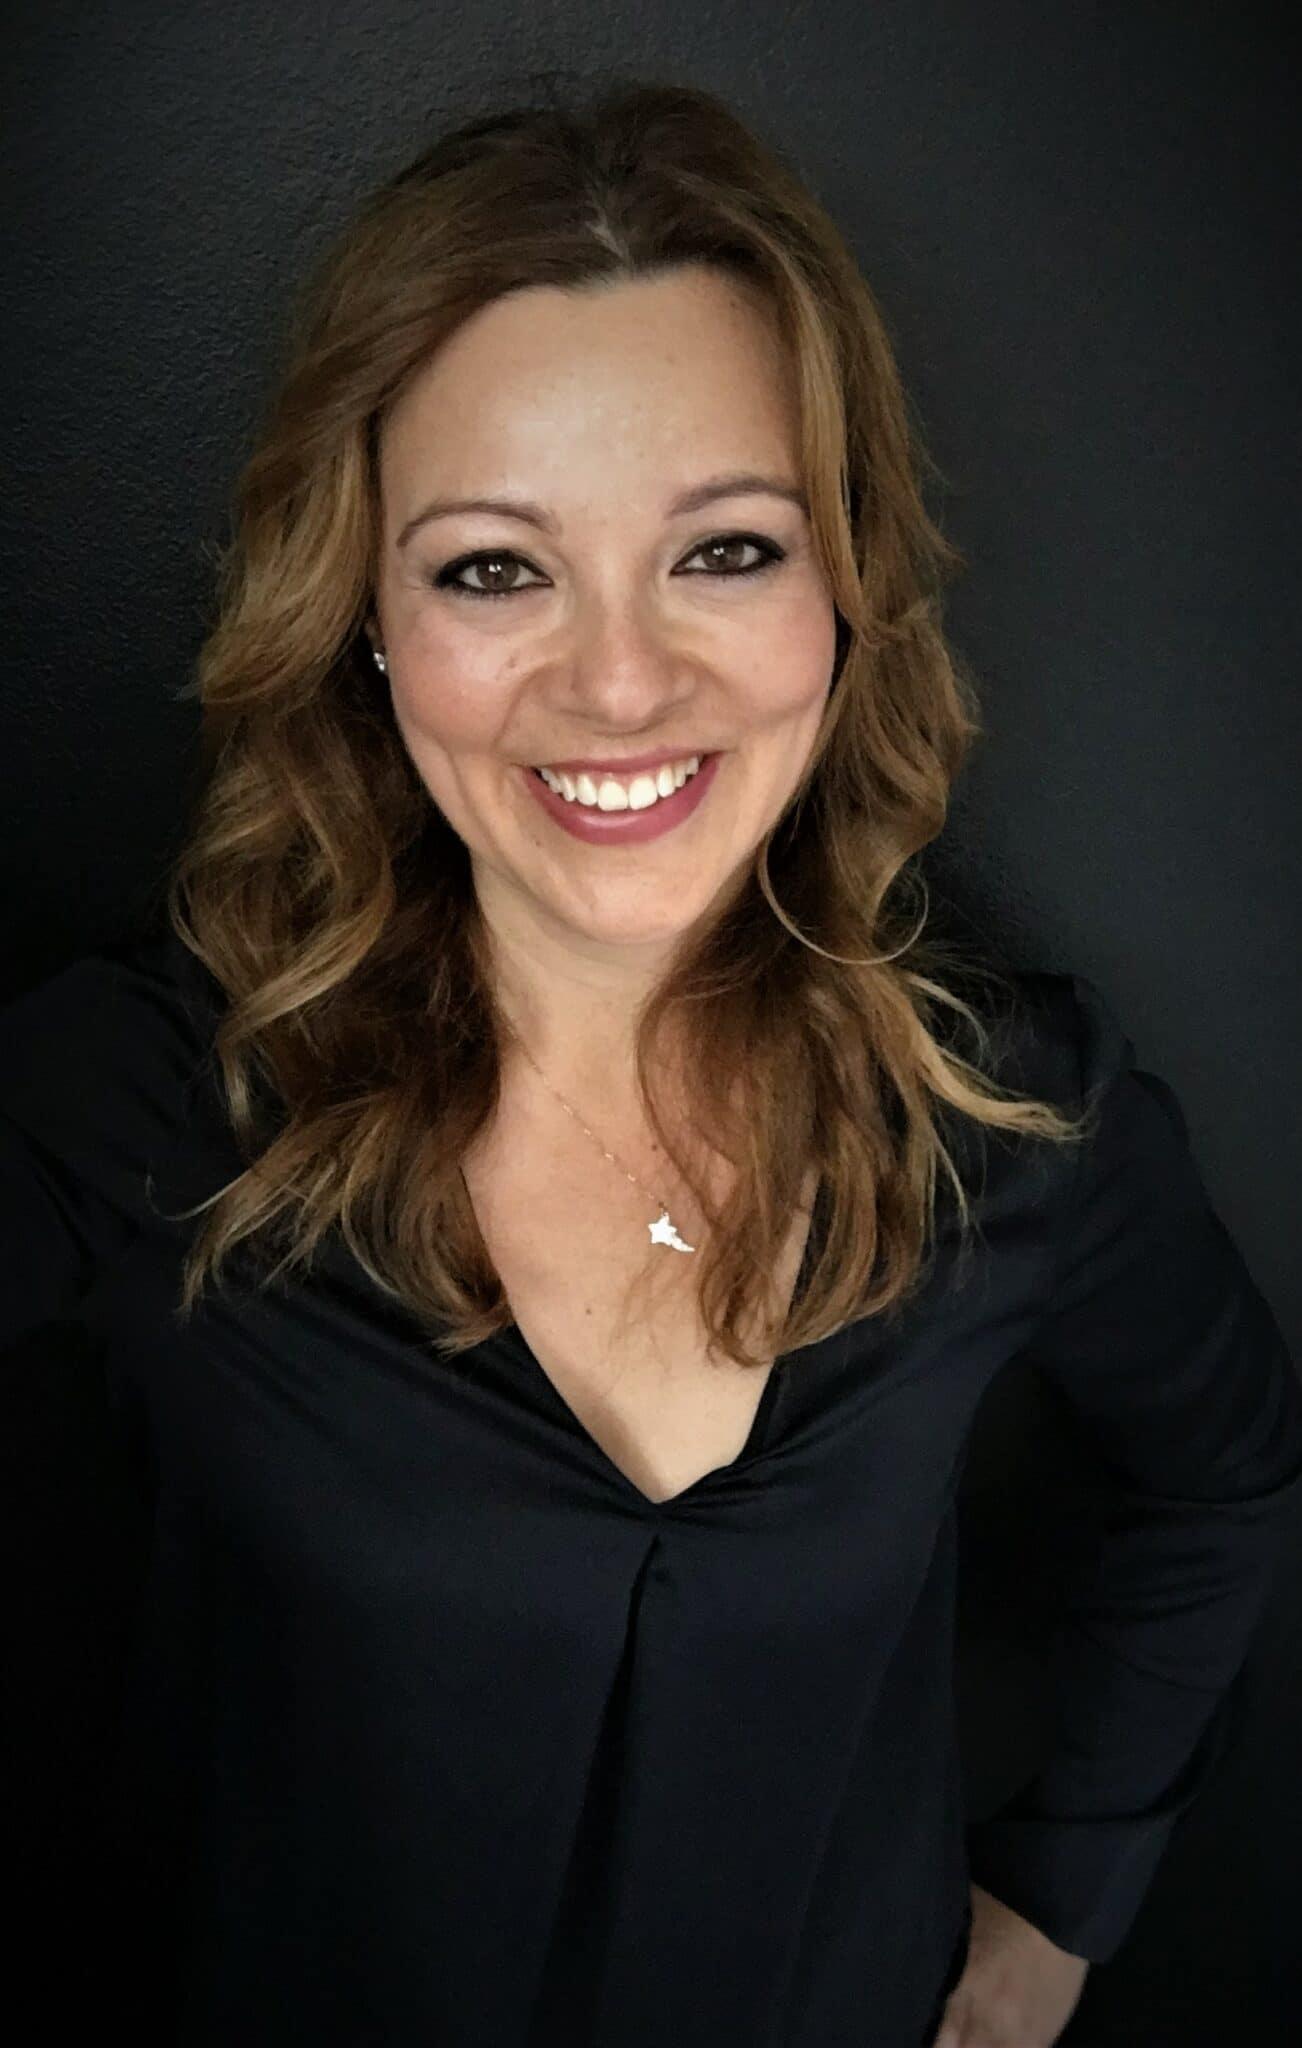 Danielle Owen Whitford Pioneera